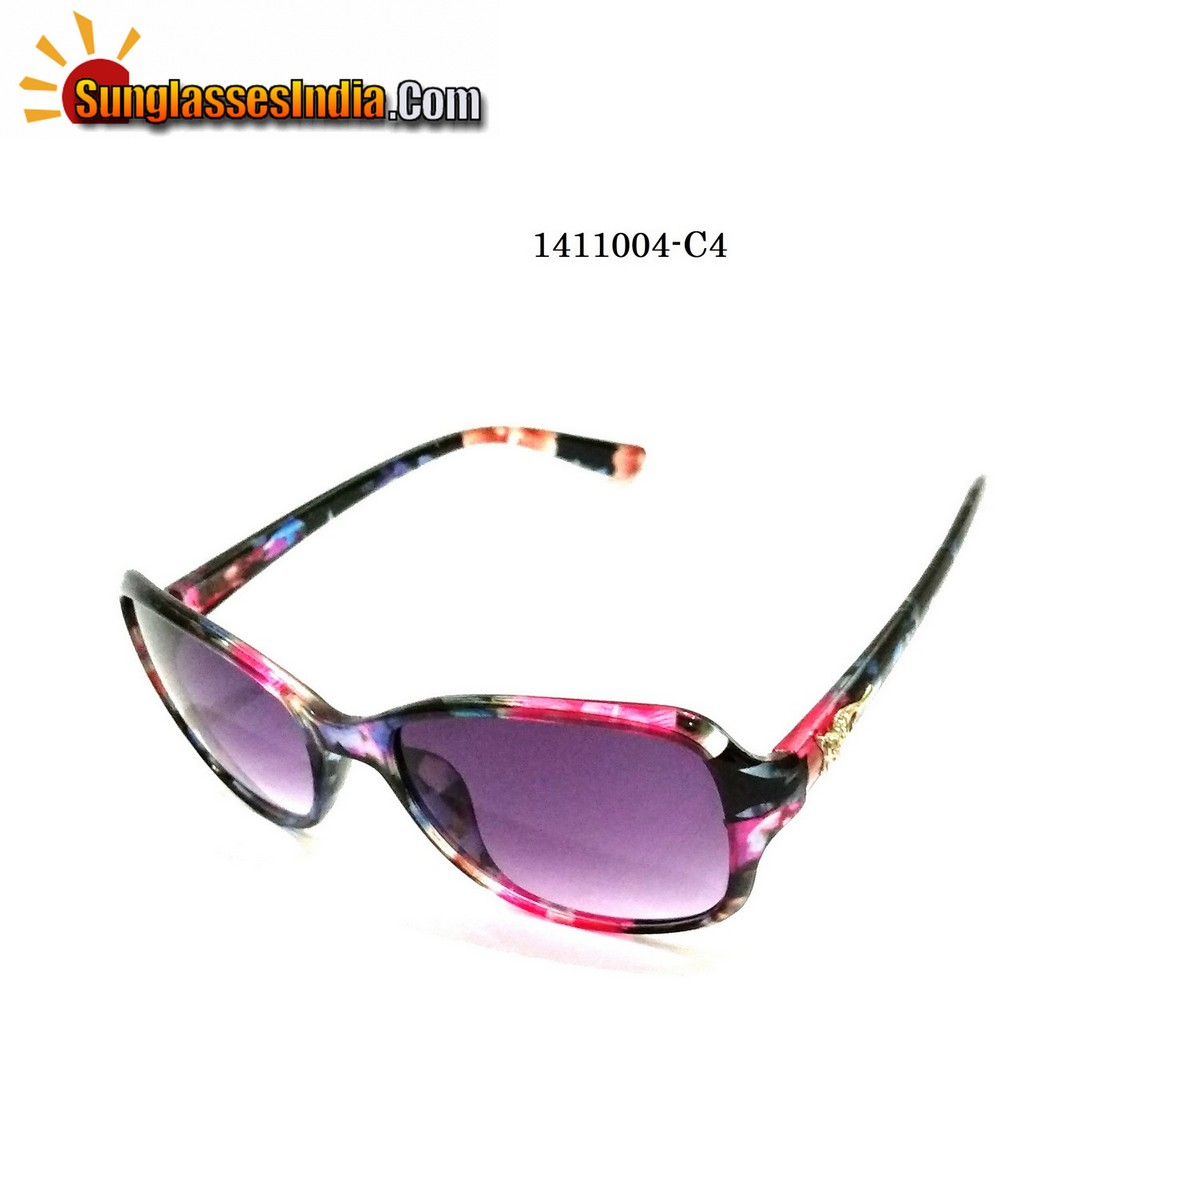 Floral Print Ladies Women Sunglasses Model 1141004C4